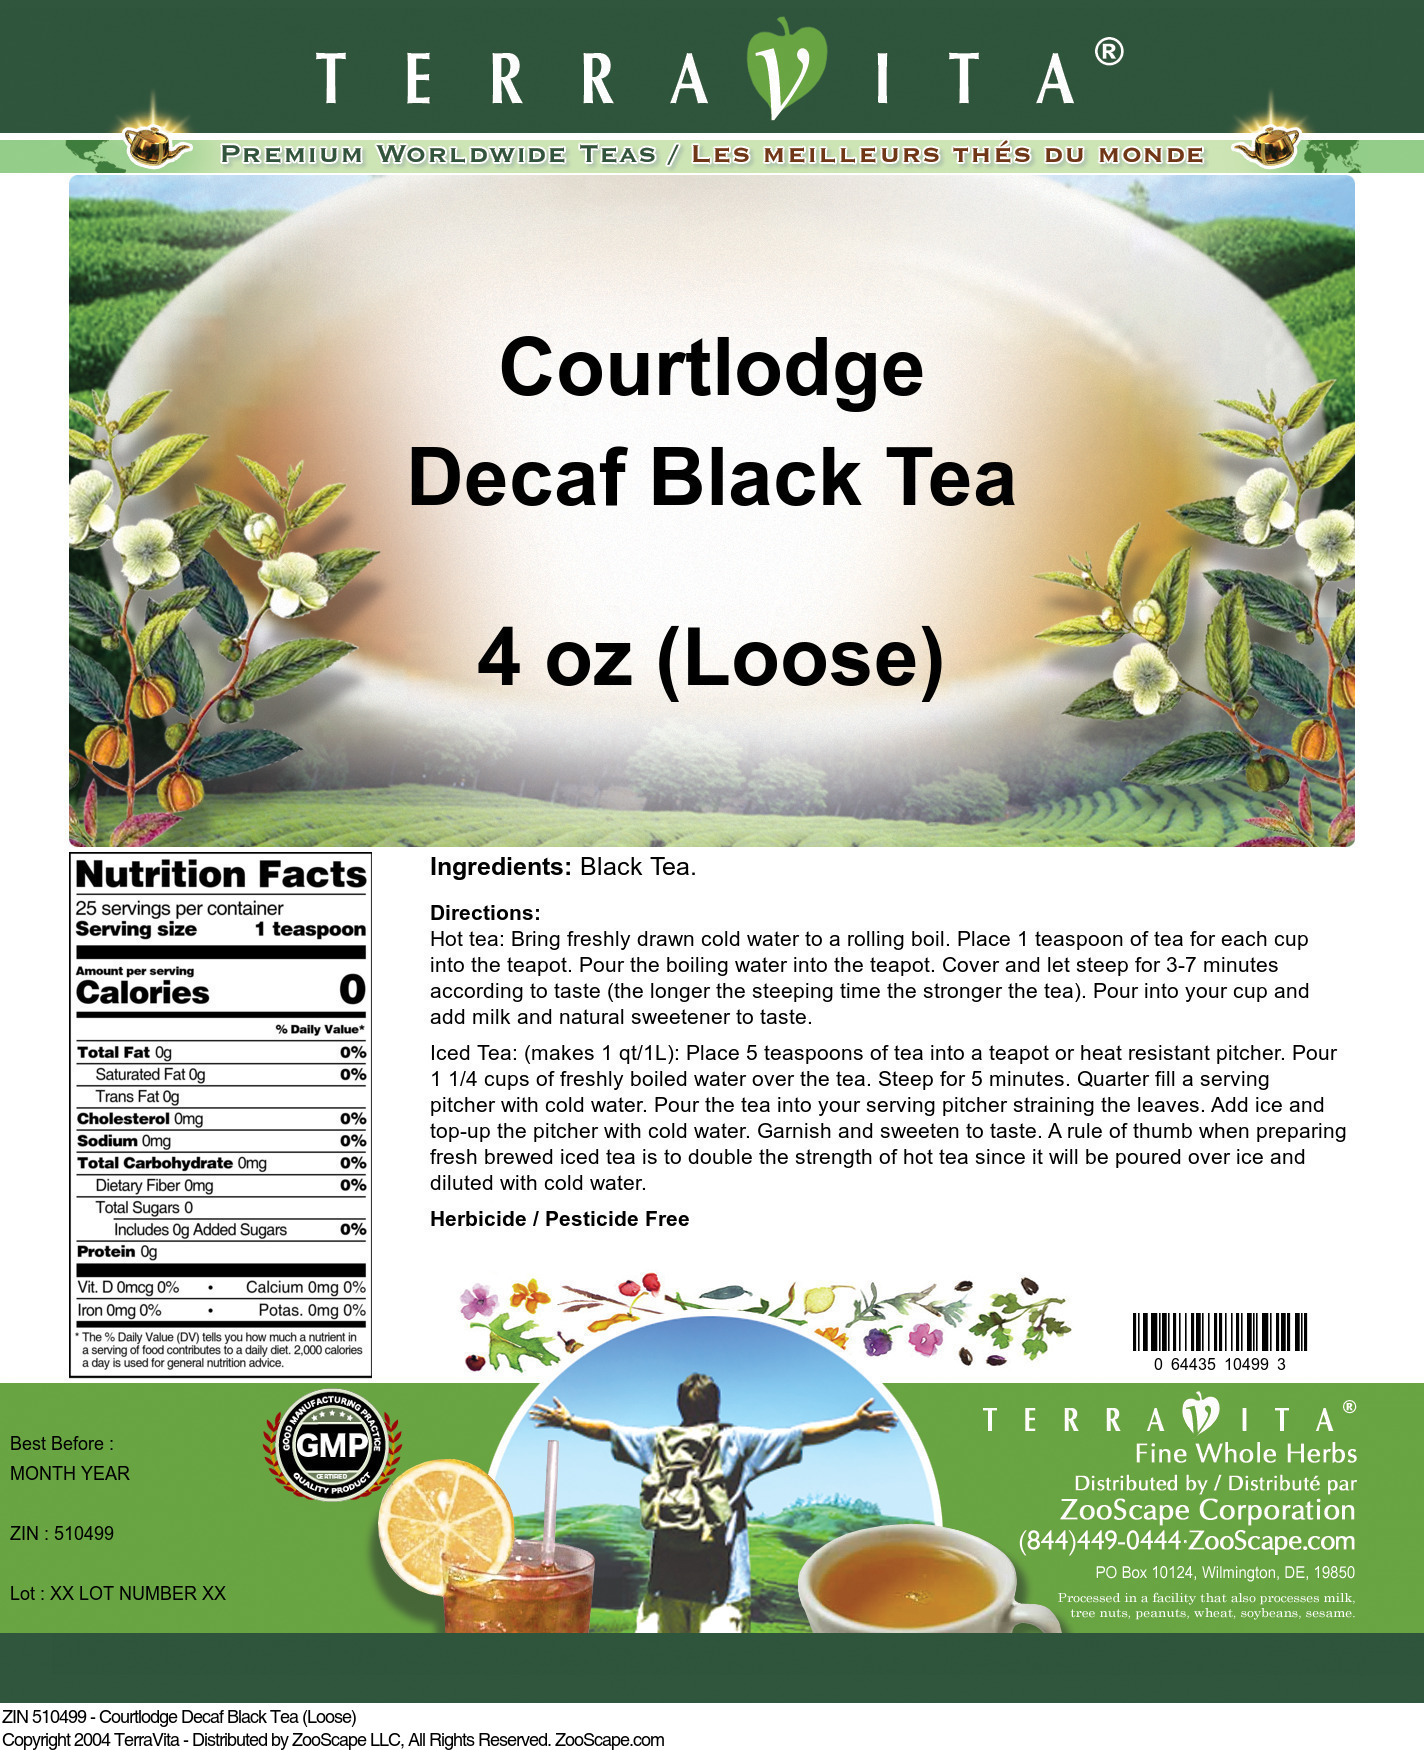 Courtlodge Decaf Black Tea (Loose)